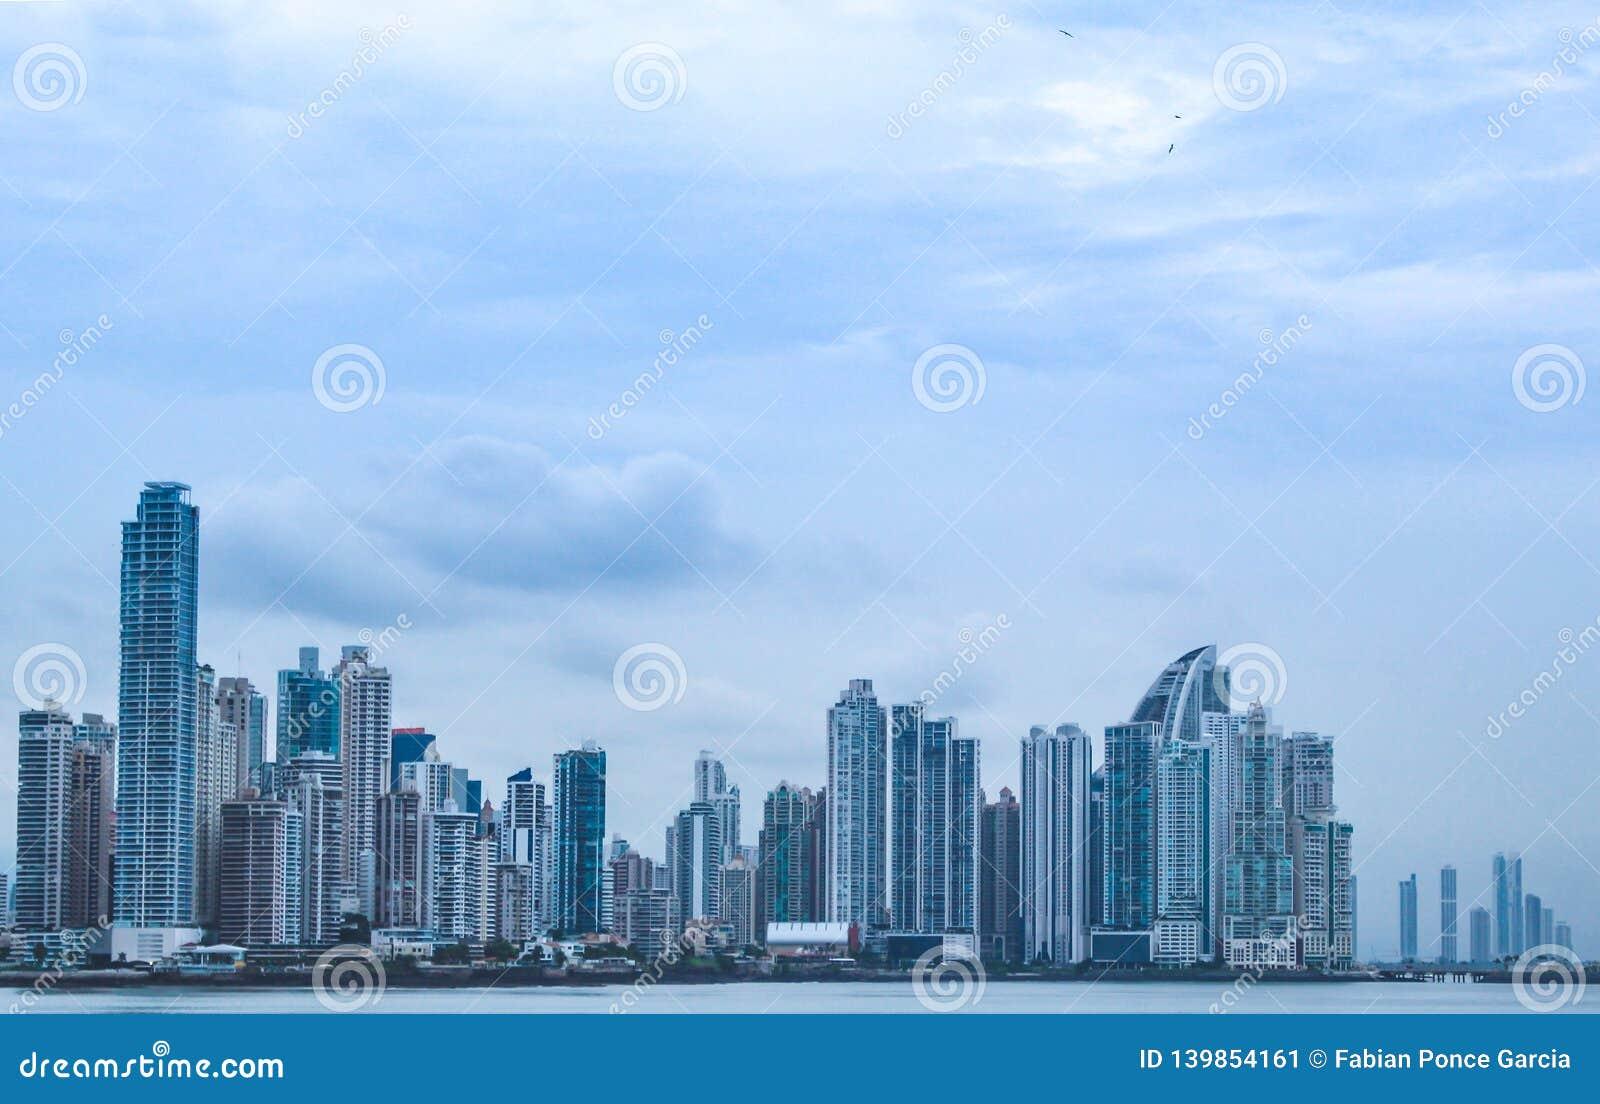 View of buildings in Panama over the ocean